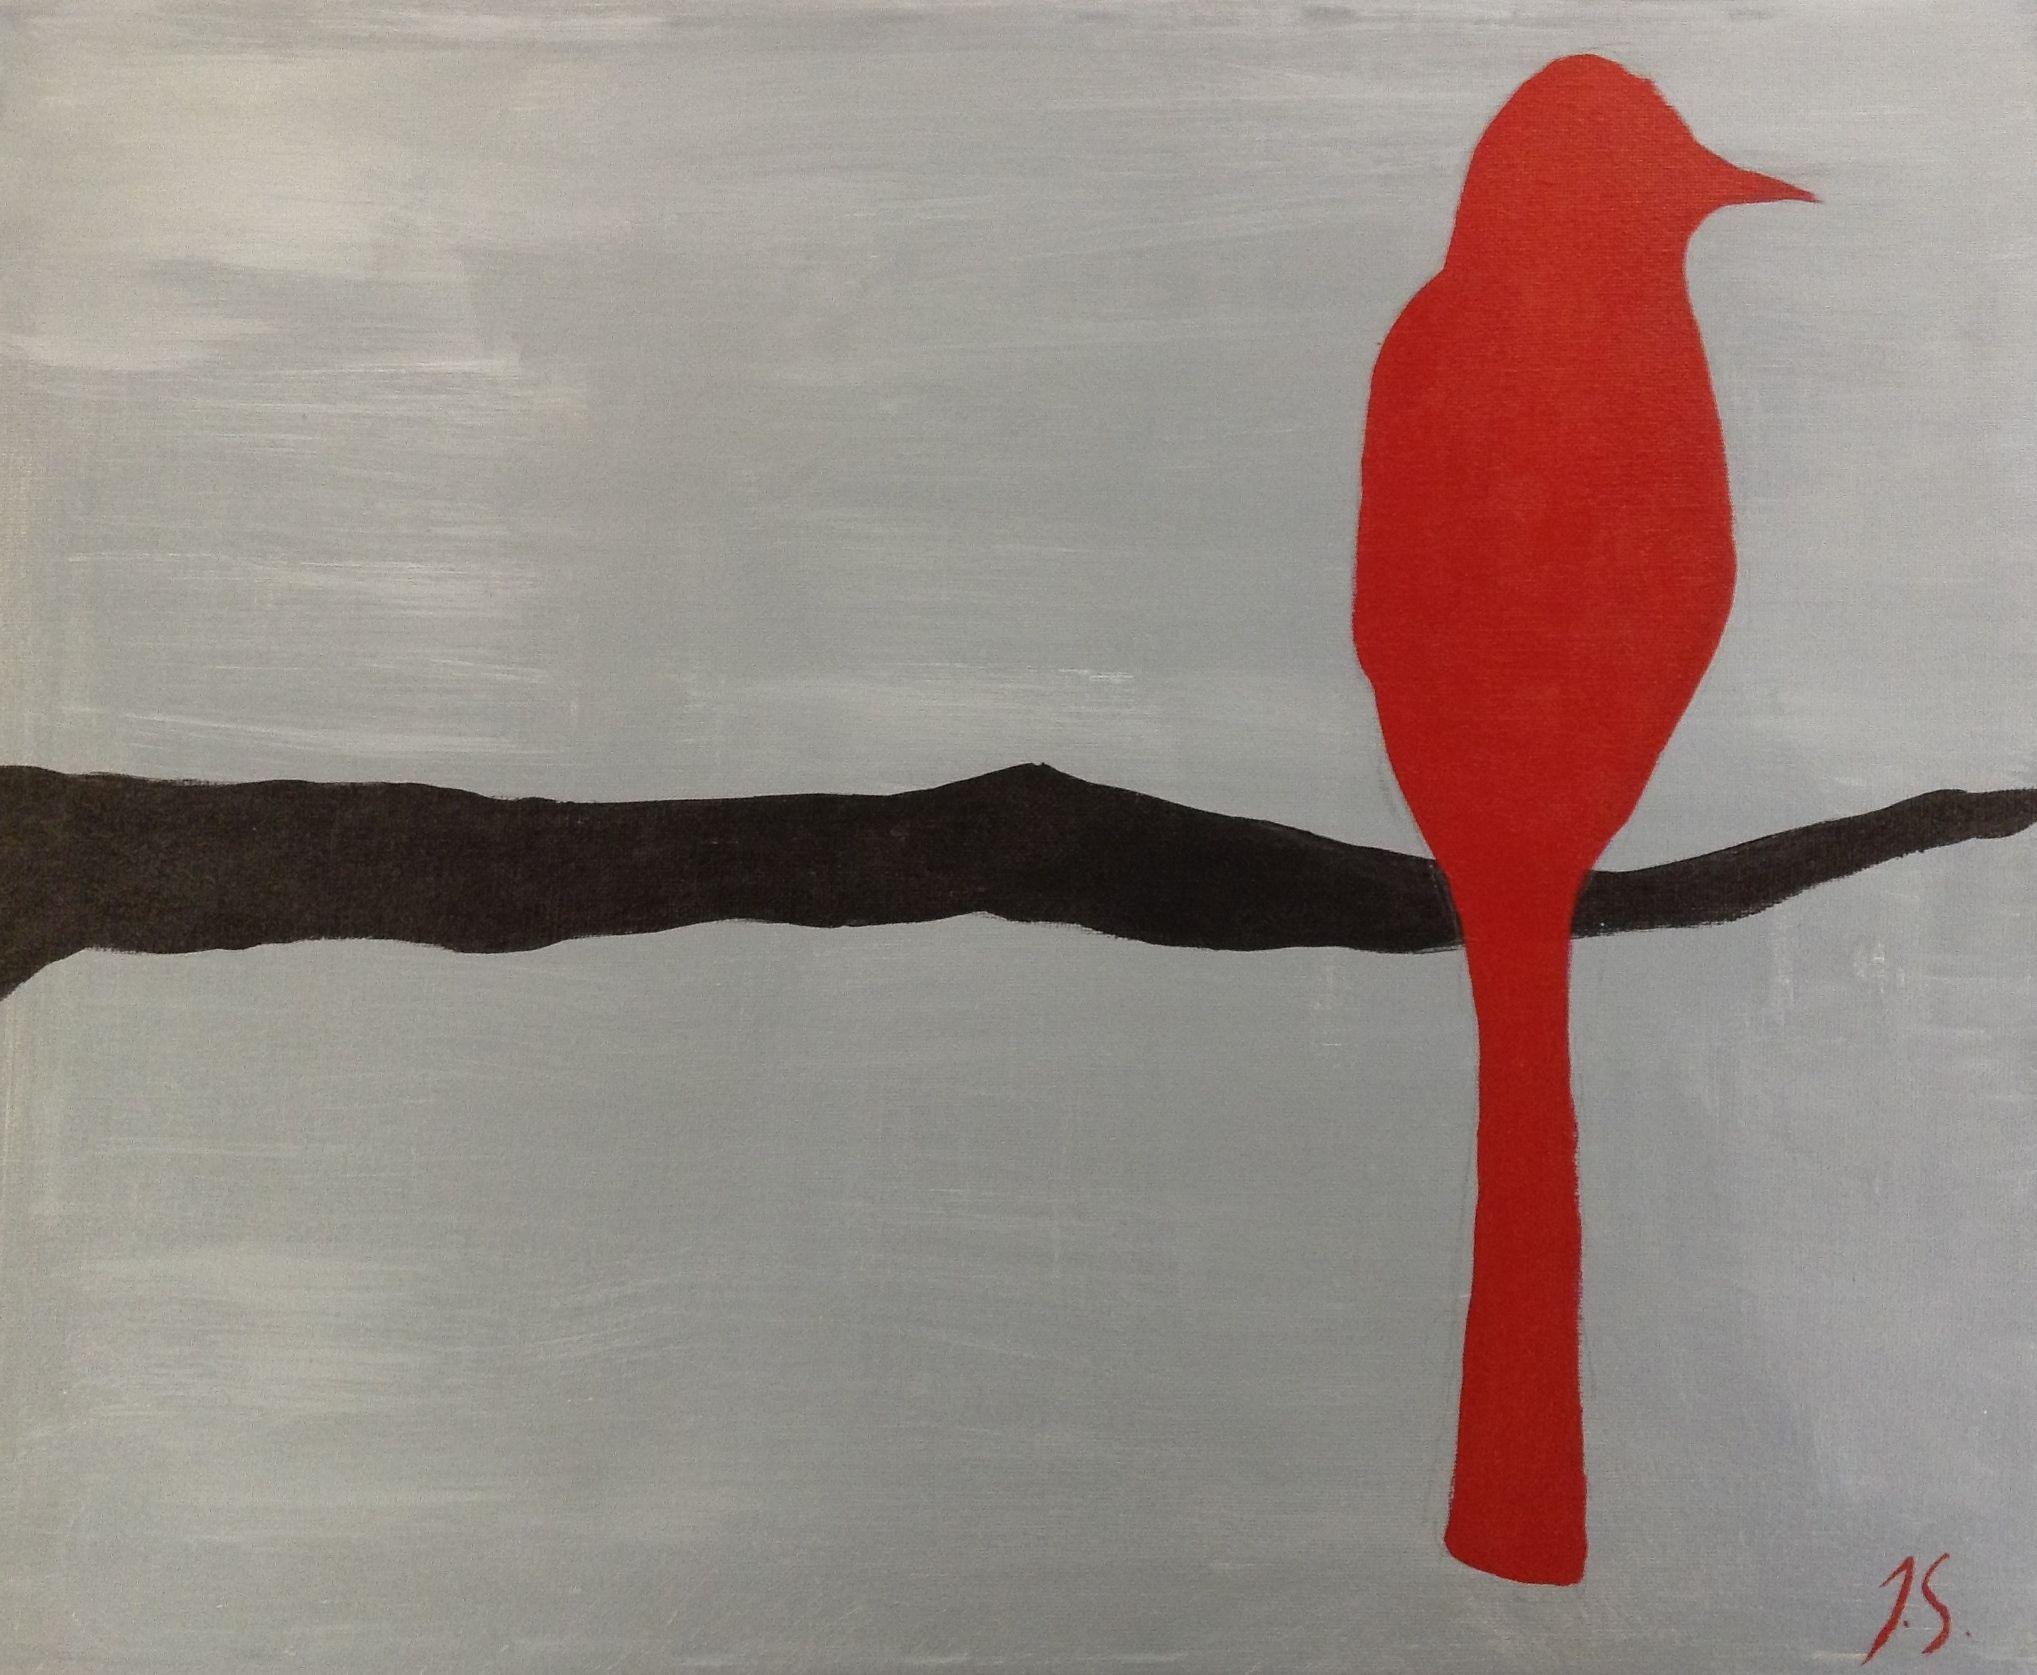 Acrylic bird. Made this for a graduation present.